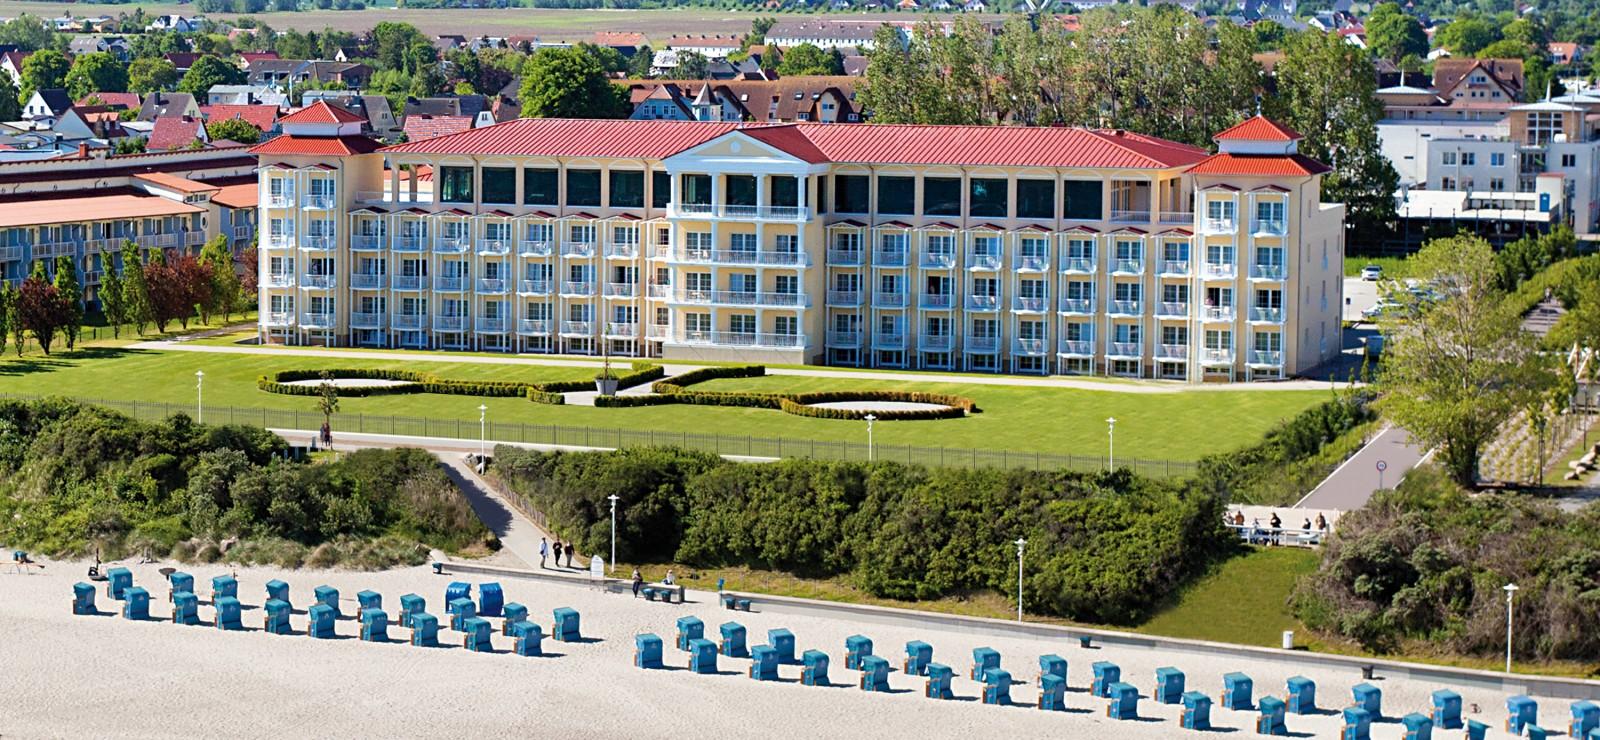 MORADA Strandhotel Ostseebad Kühlungsborn Bilder | Bild 1